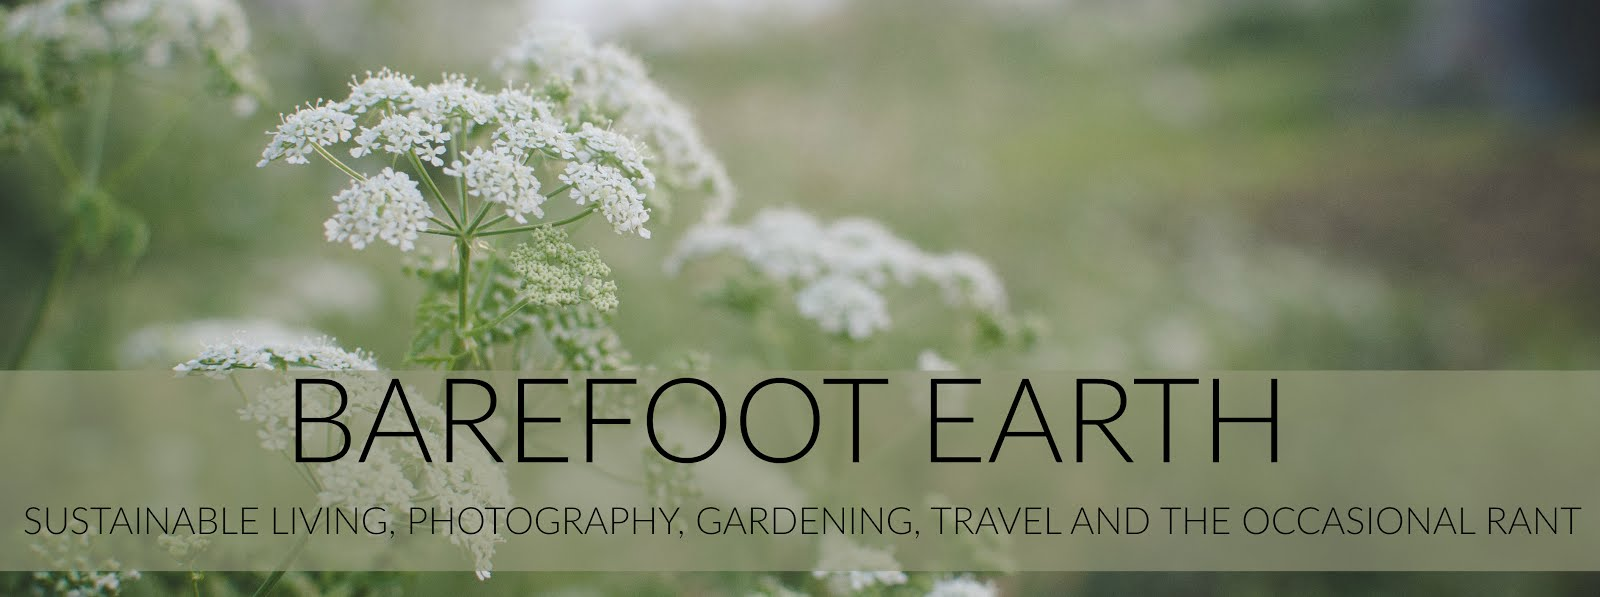 Barefoot Earth